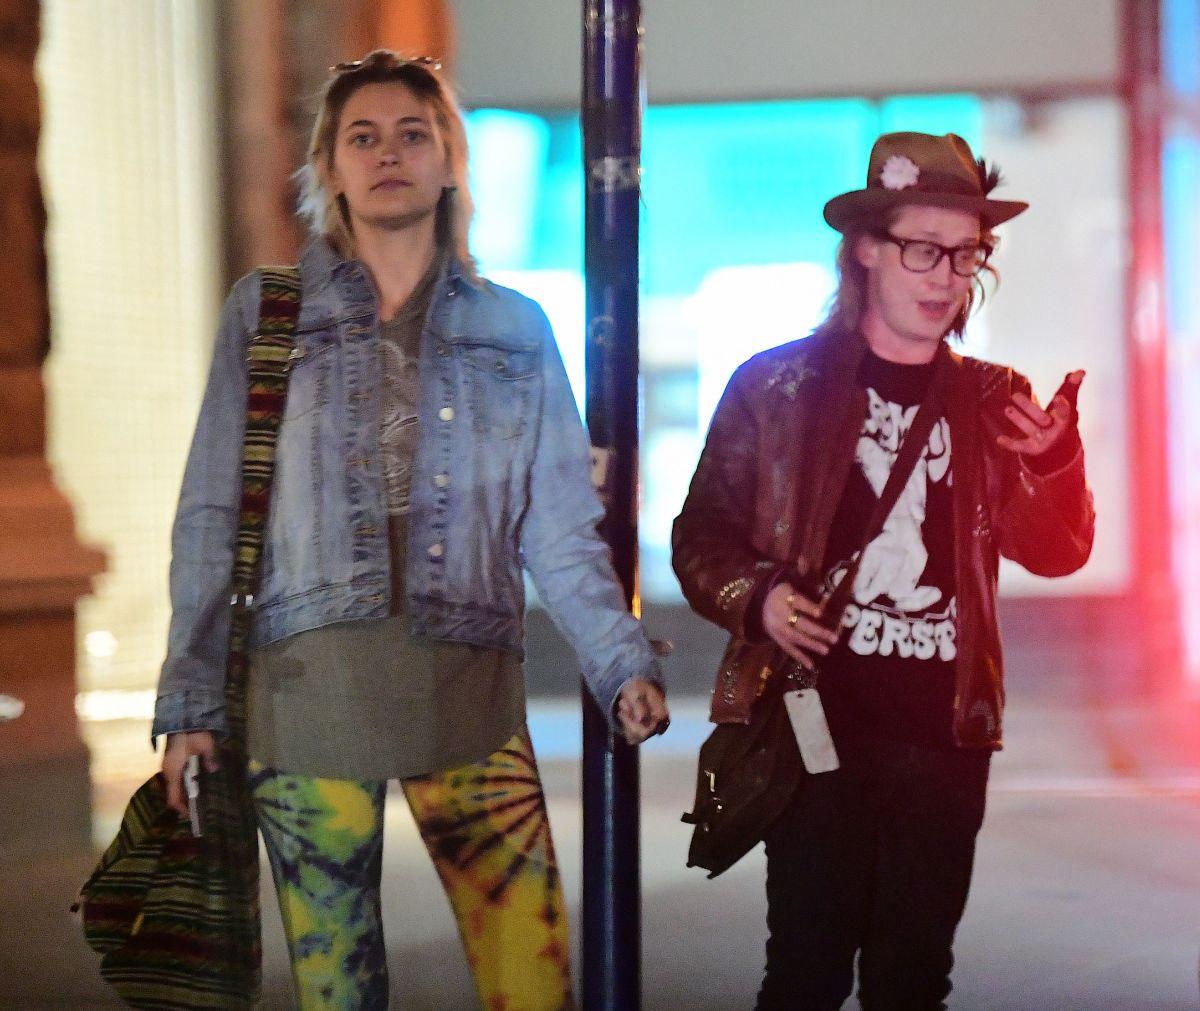 PARIS JACKSON and Macaulay Culkin Out in New York 05/05/2017